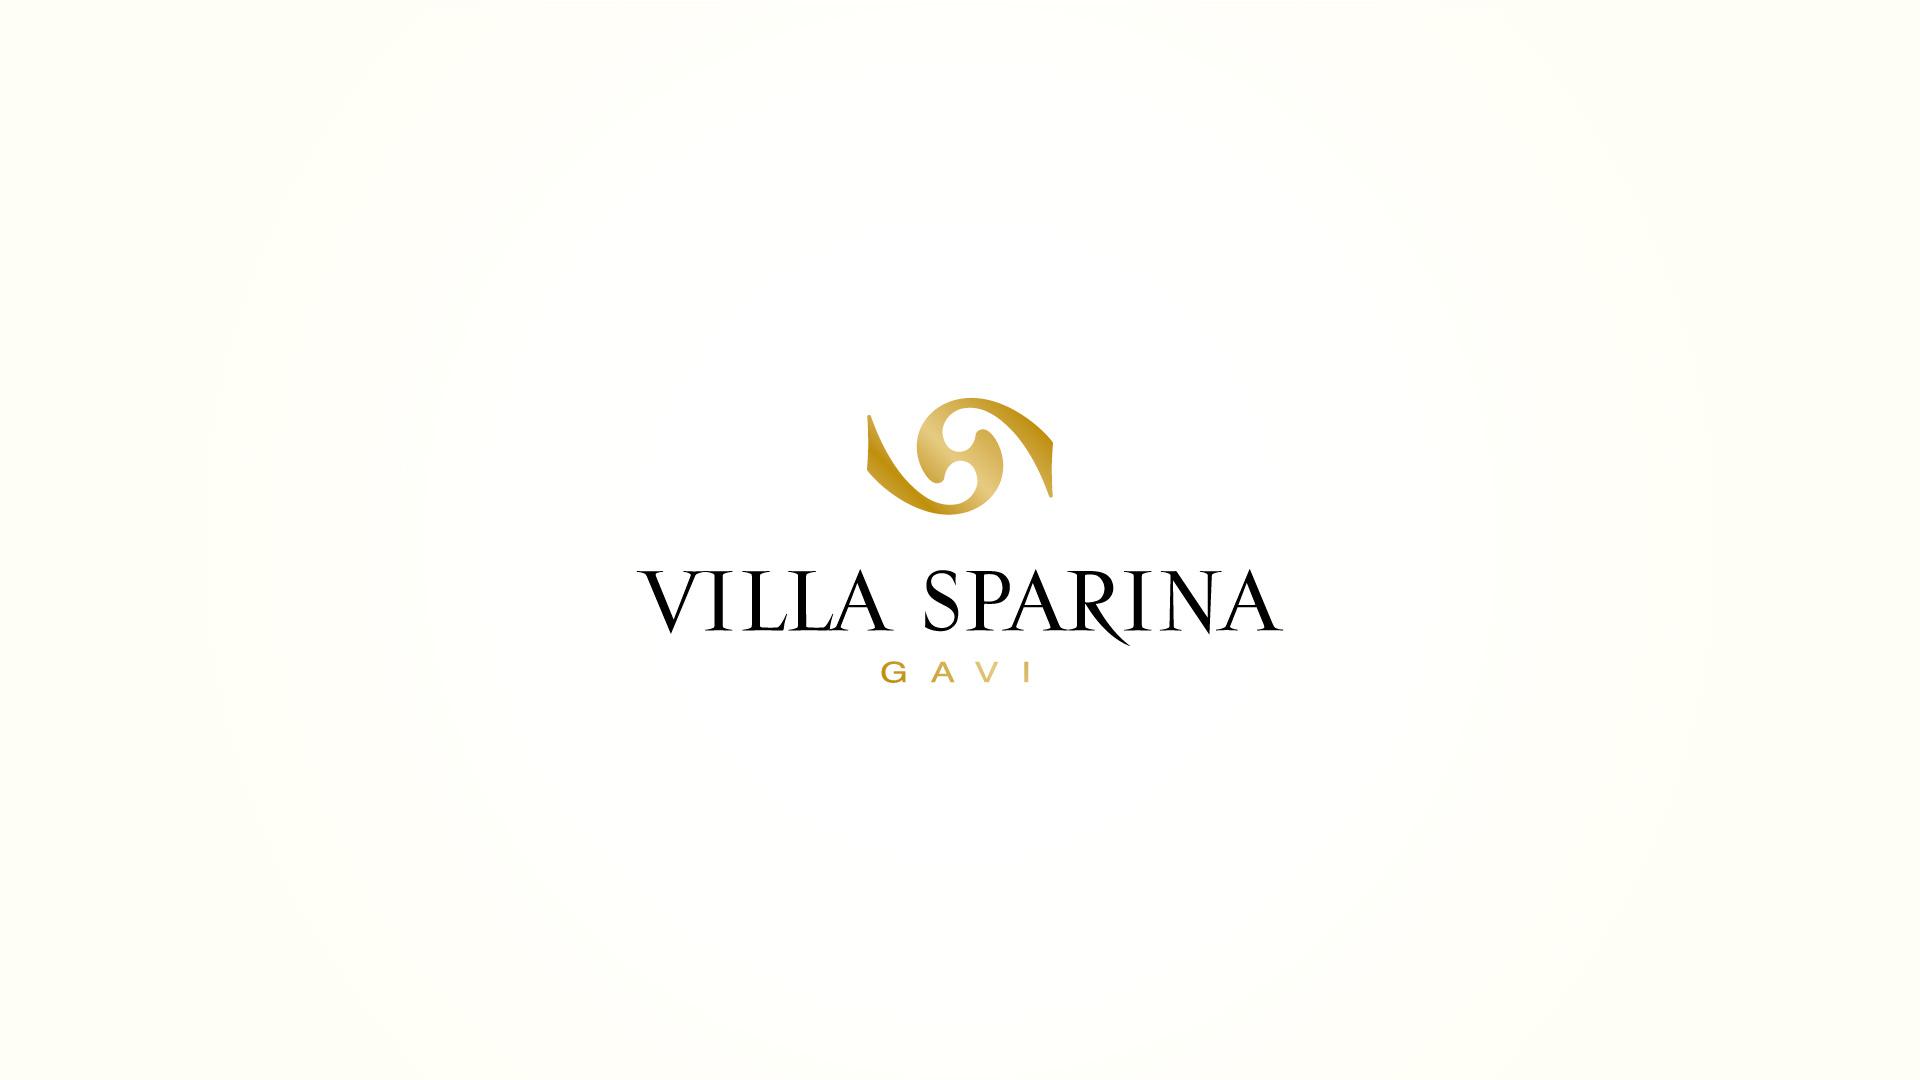 Villa Sparina brand